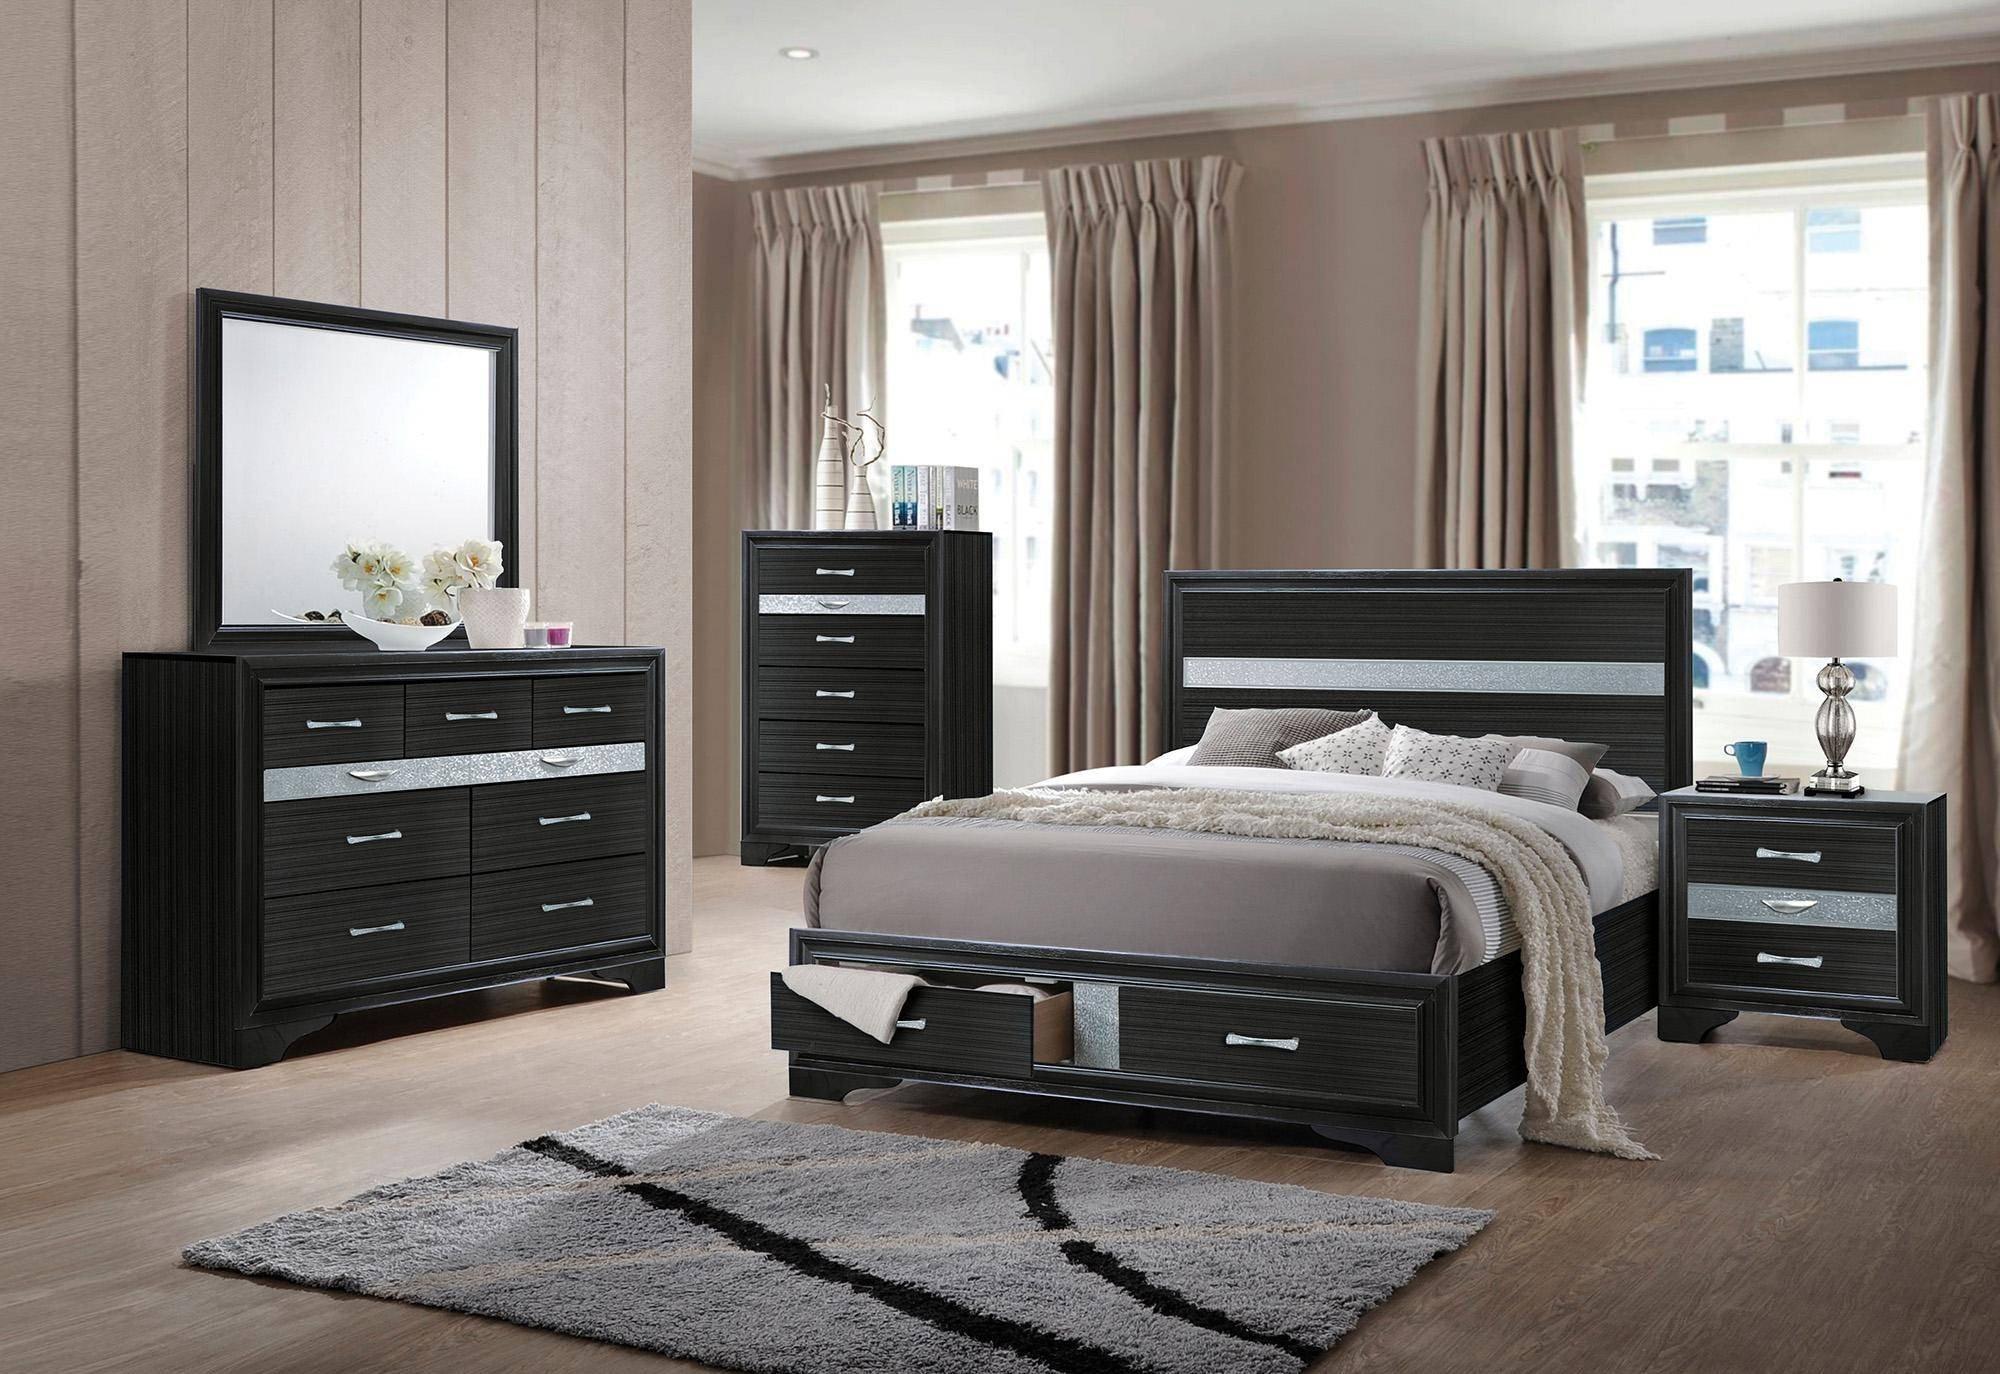 Mission Style Bedroom Furniture Unique Black Wood Queen Storage Bedroom Set 4pcs Naima Q Acme